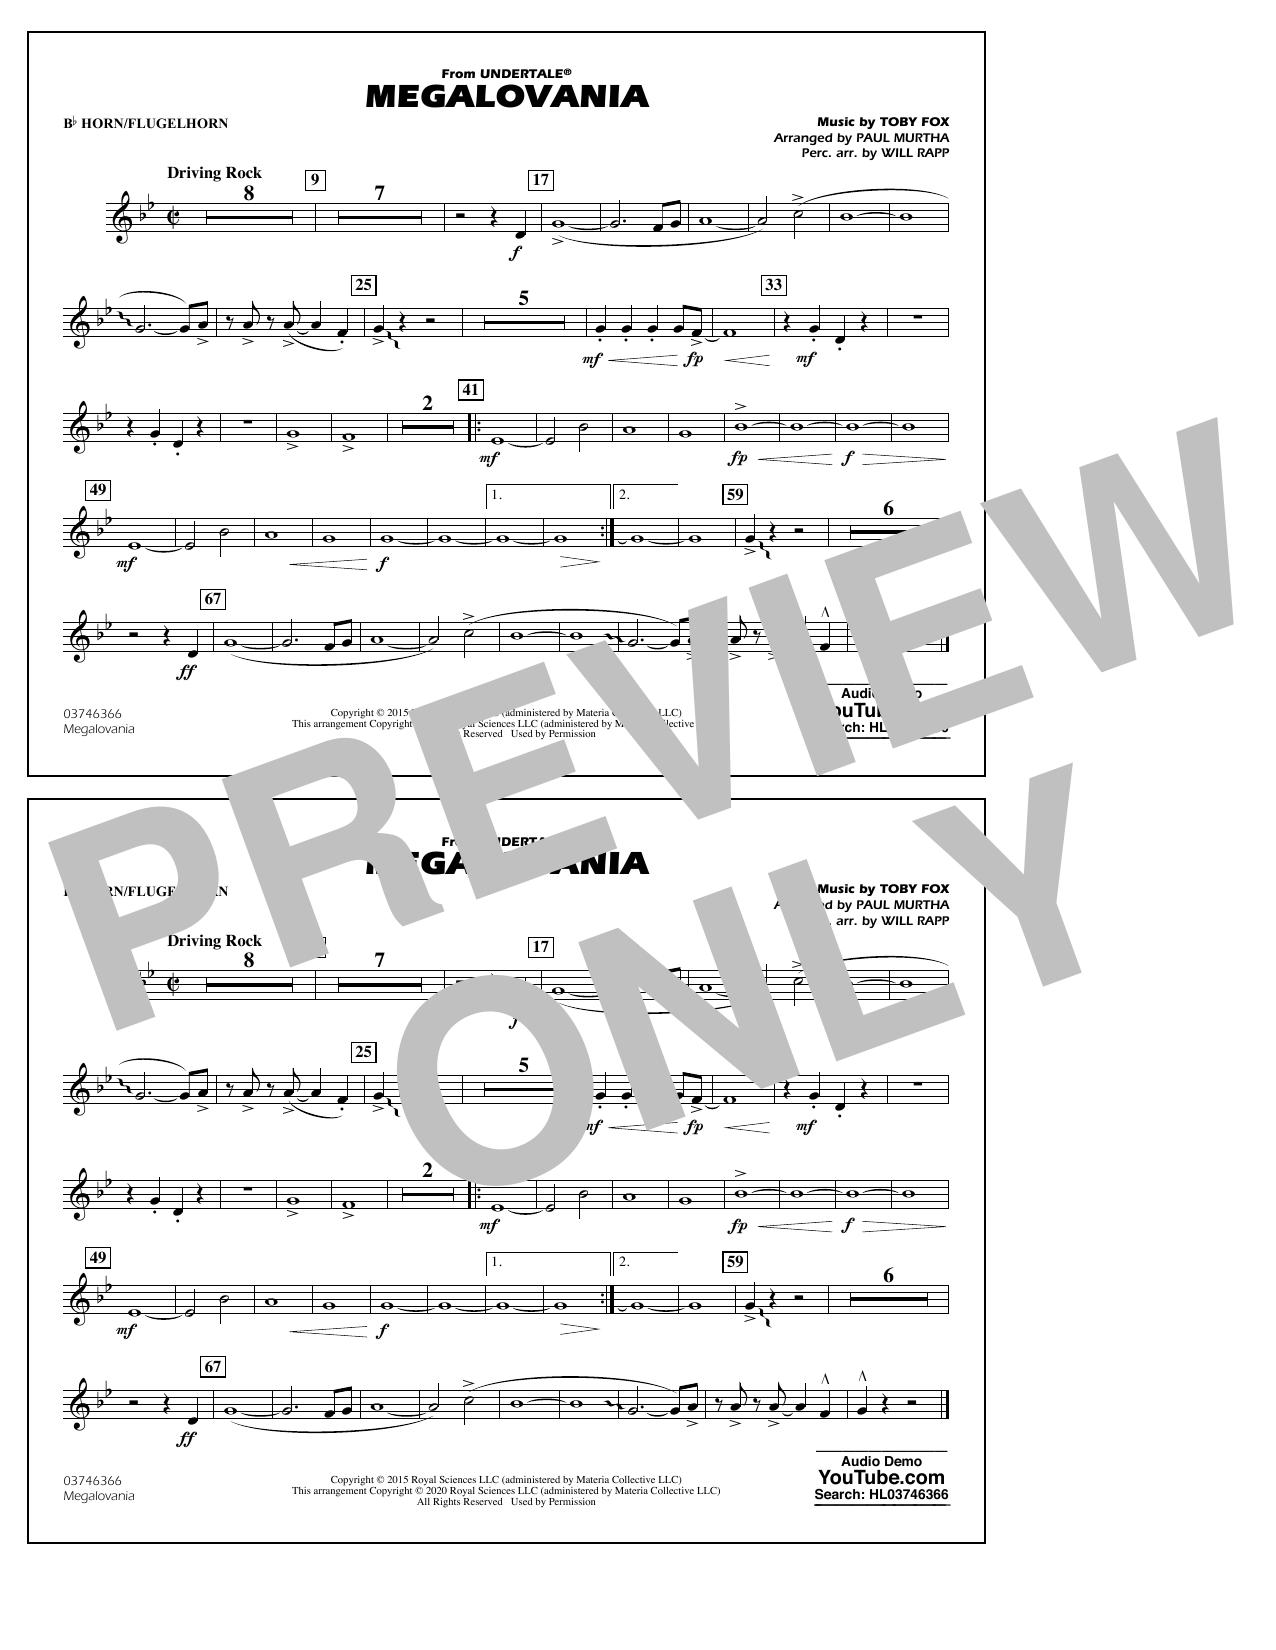 Megalovania (from Undertale) (arr. Paul Murtha) - Bb Horn/Flugelhorn Sheet Music